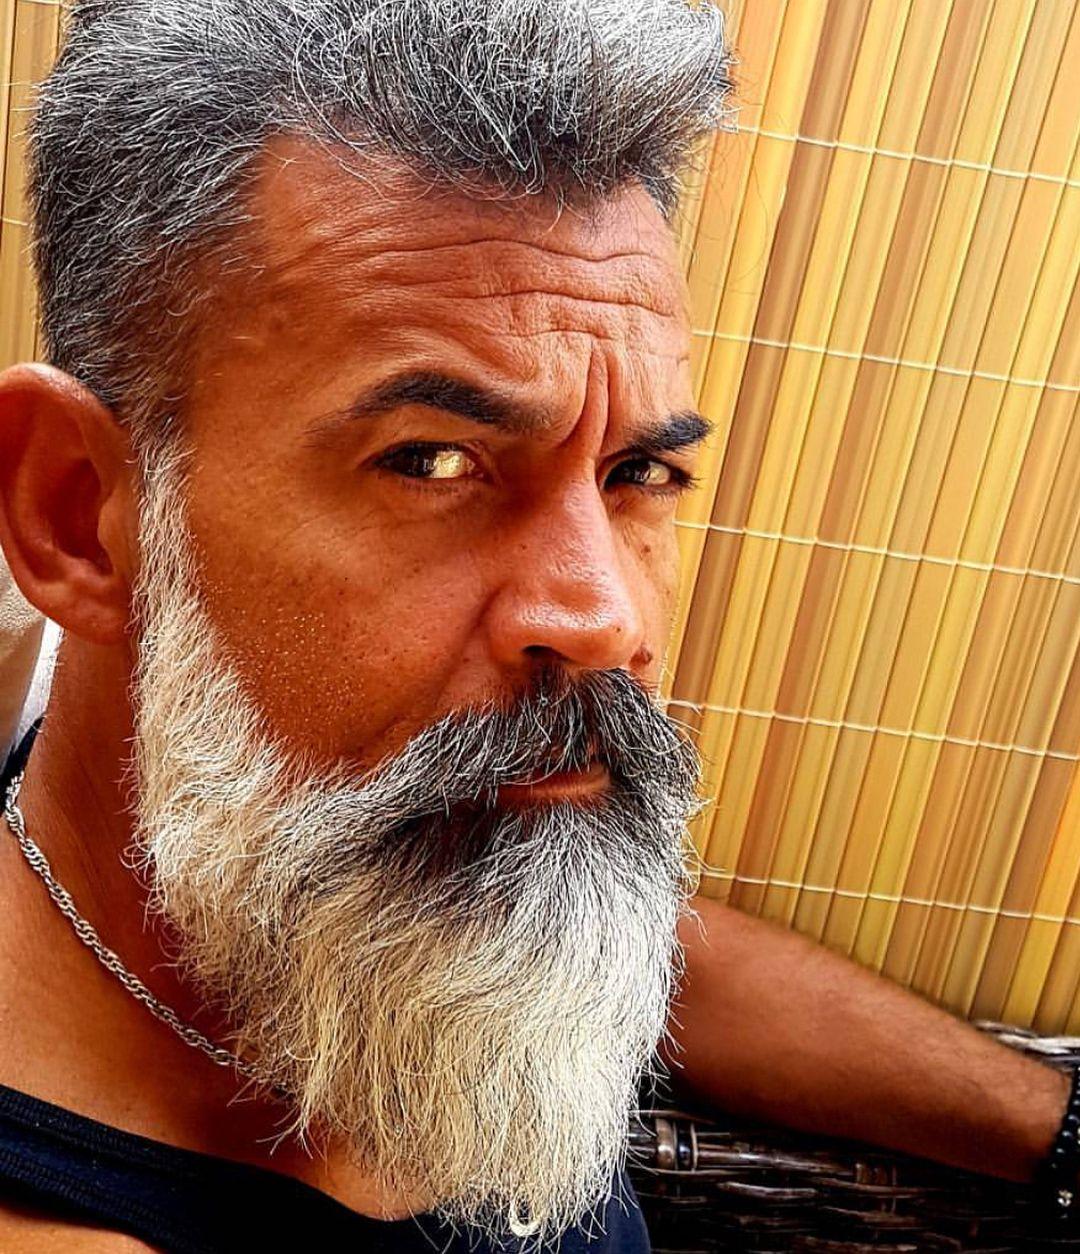 efendy.ekinm  beautifulbeard  beardmodel  bärtig  baard  bart  barbu   beard  beards  barba  bearded  barbudo  barbeiro  beardo  barber… 52610151f7